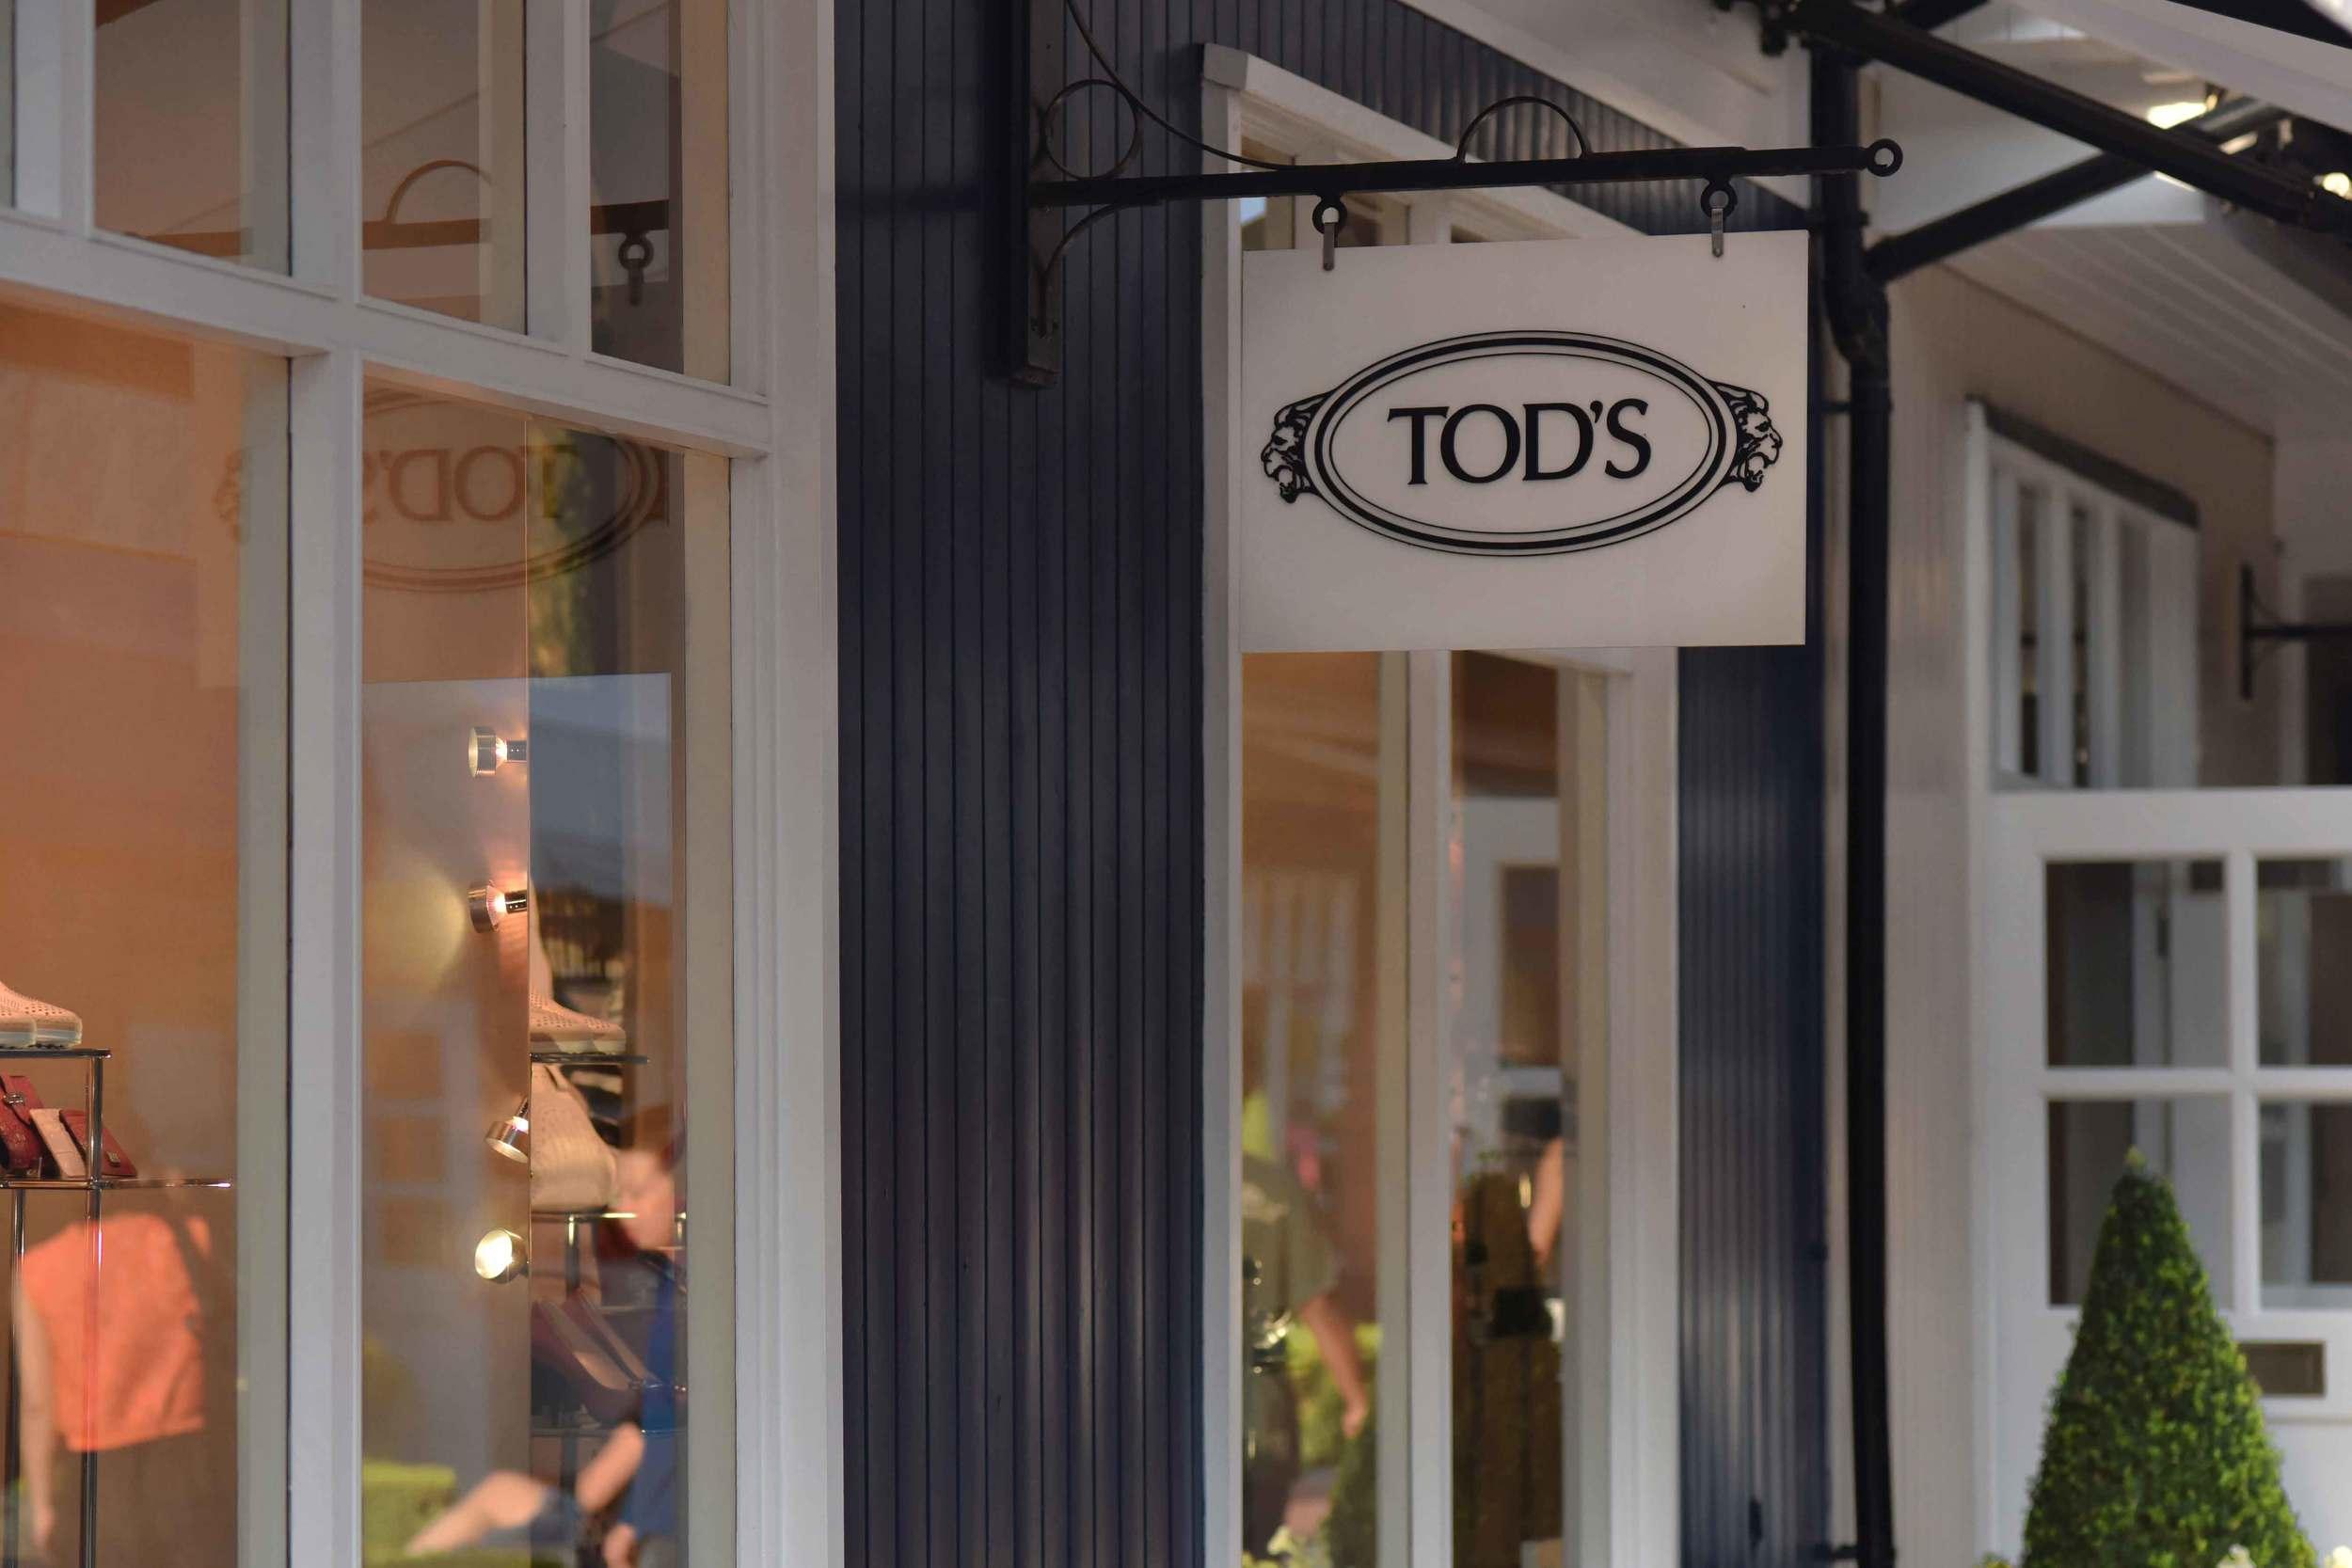 Tod's store, Bicester village, designer shopping outlet near London, UK. Image©sourcingstyle.com